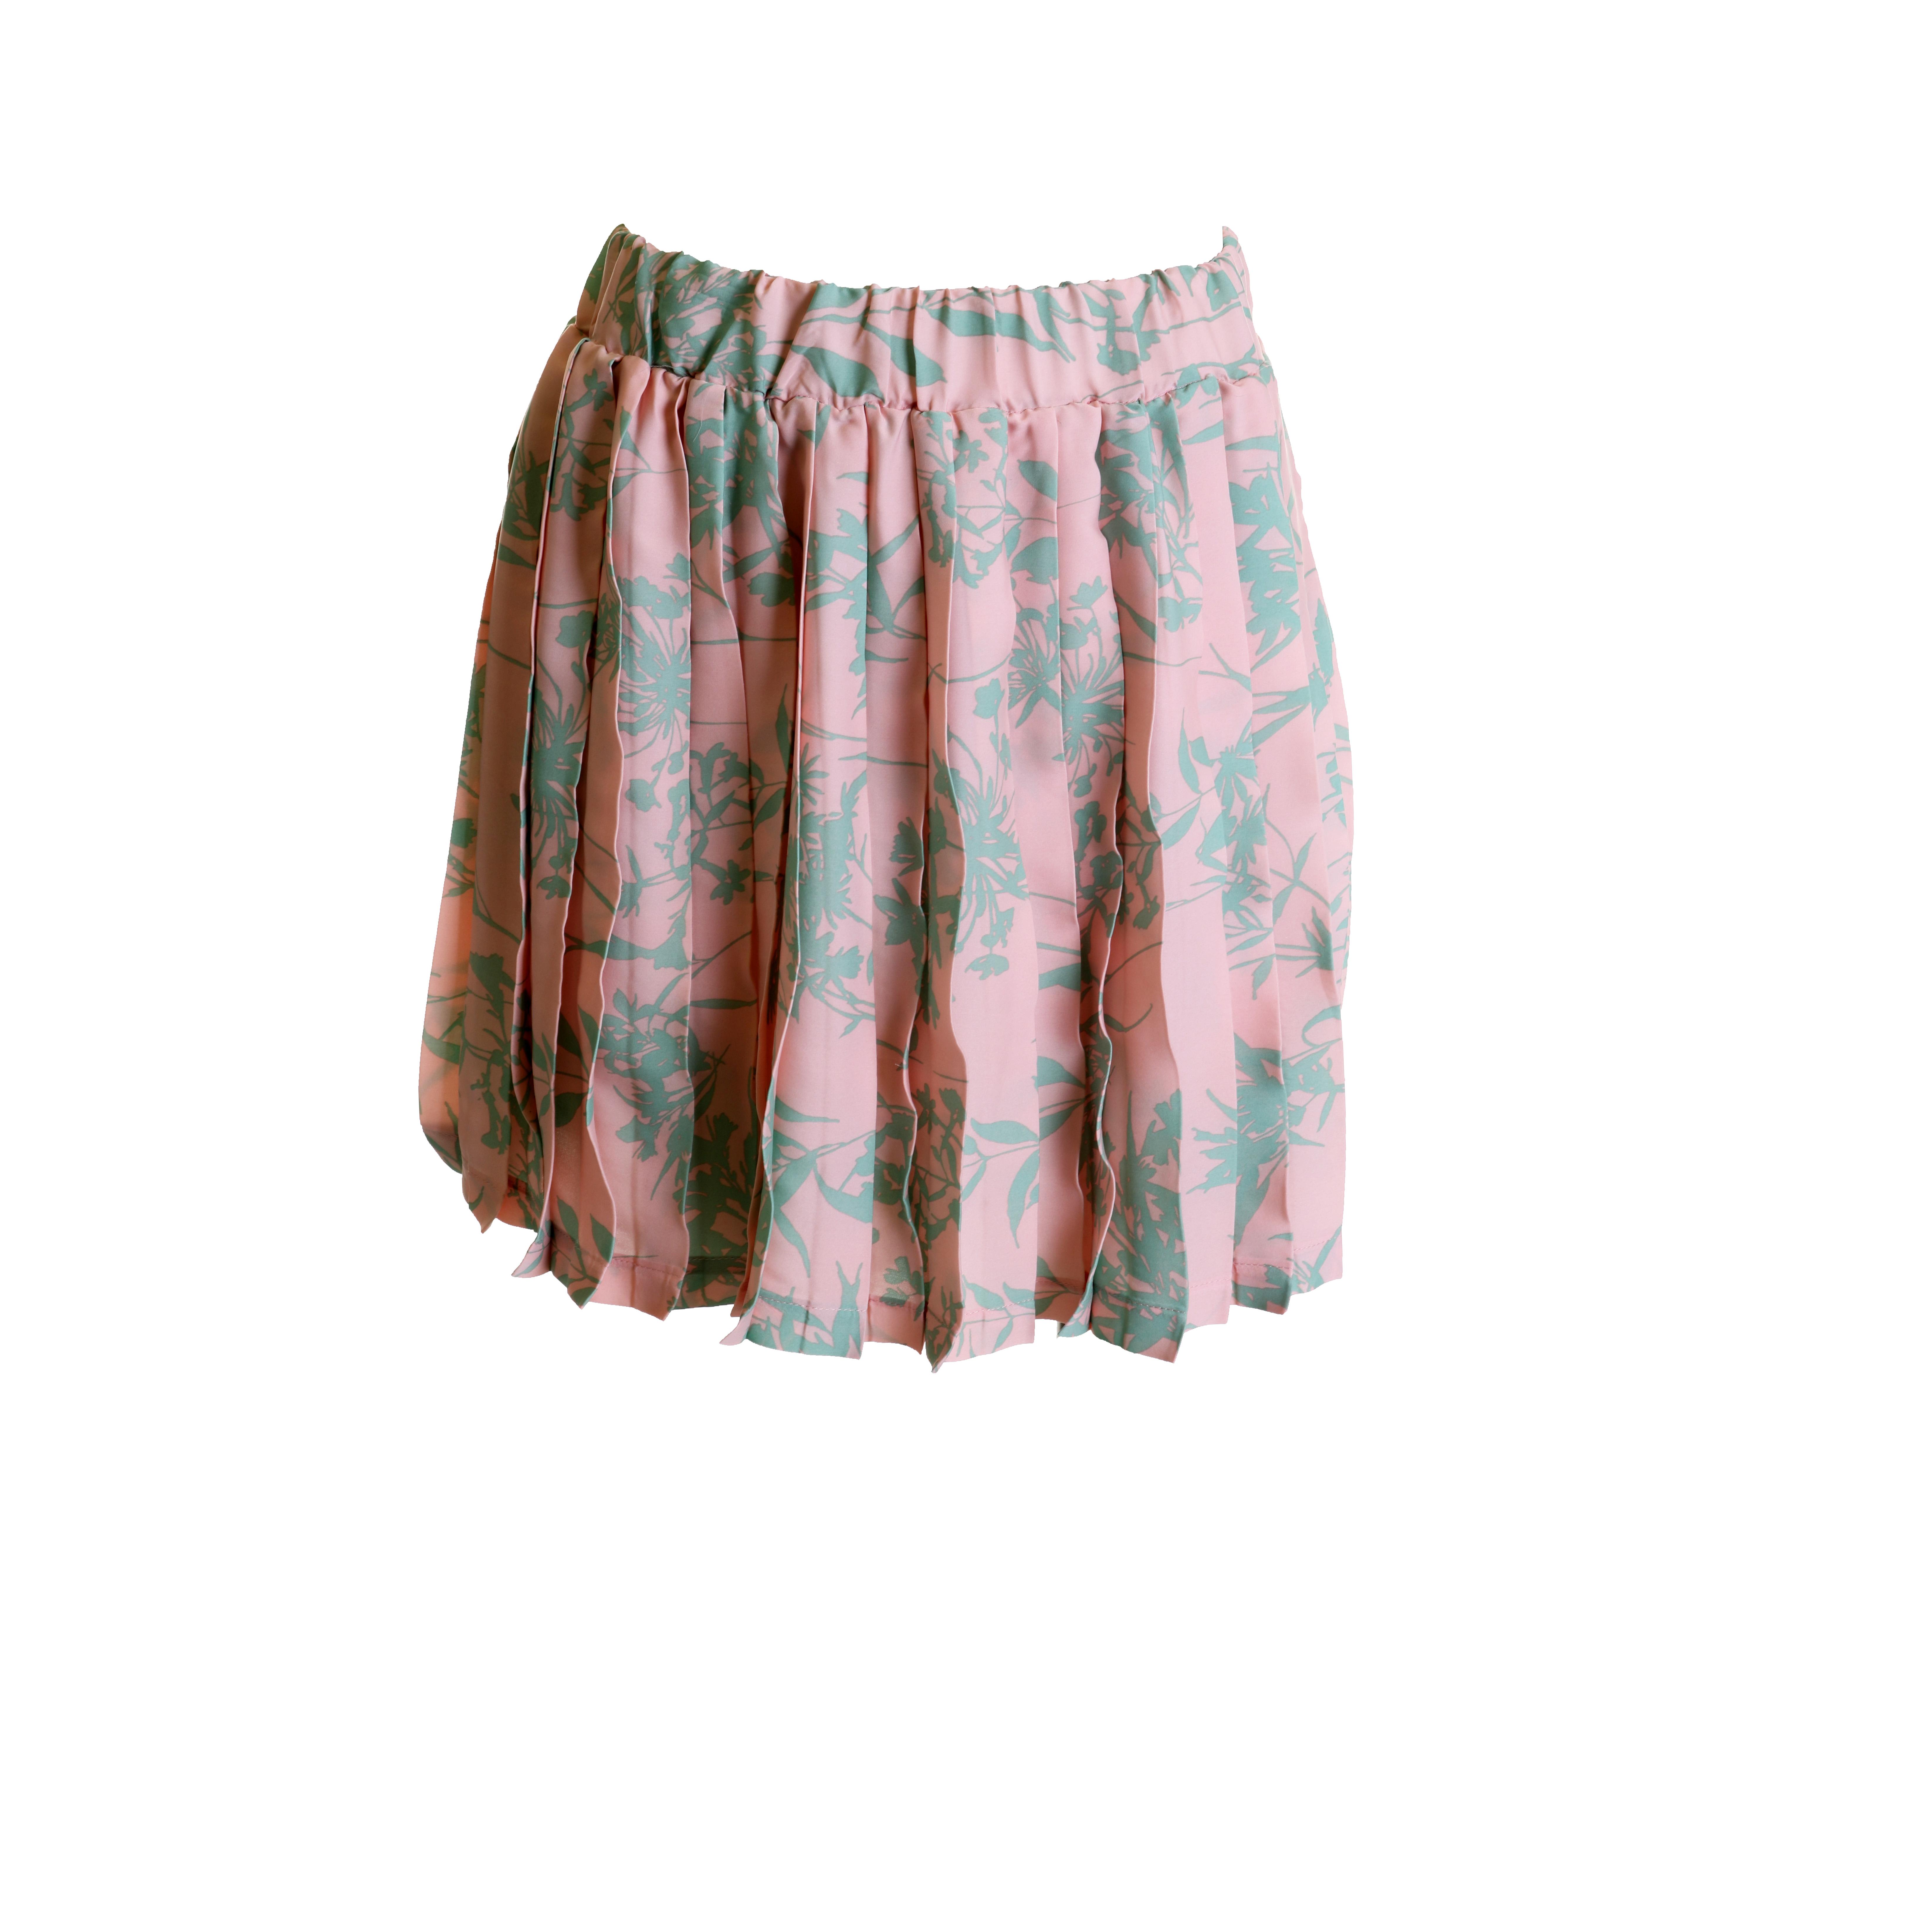 Deby Debo Pink-Green Garden Pleated Skirt